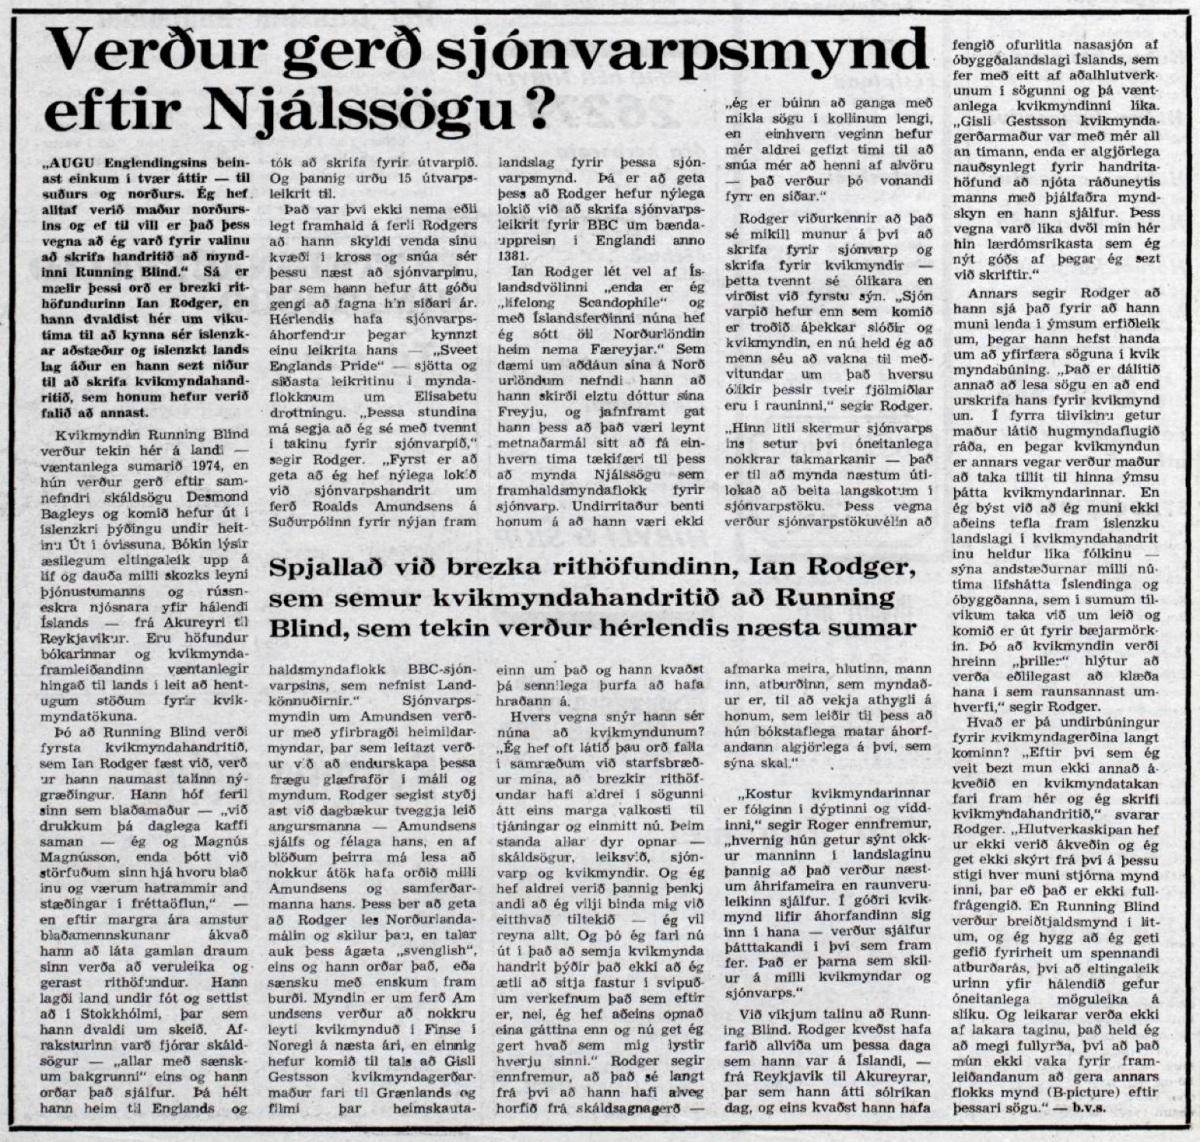 bagley-and-film-production-media-morgunbladid-19730508